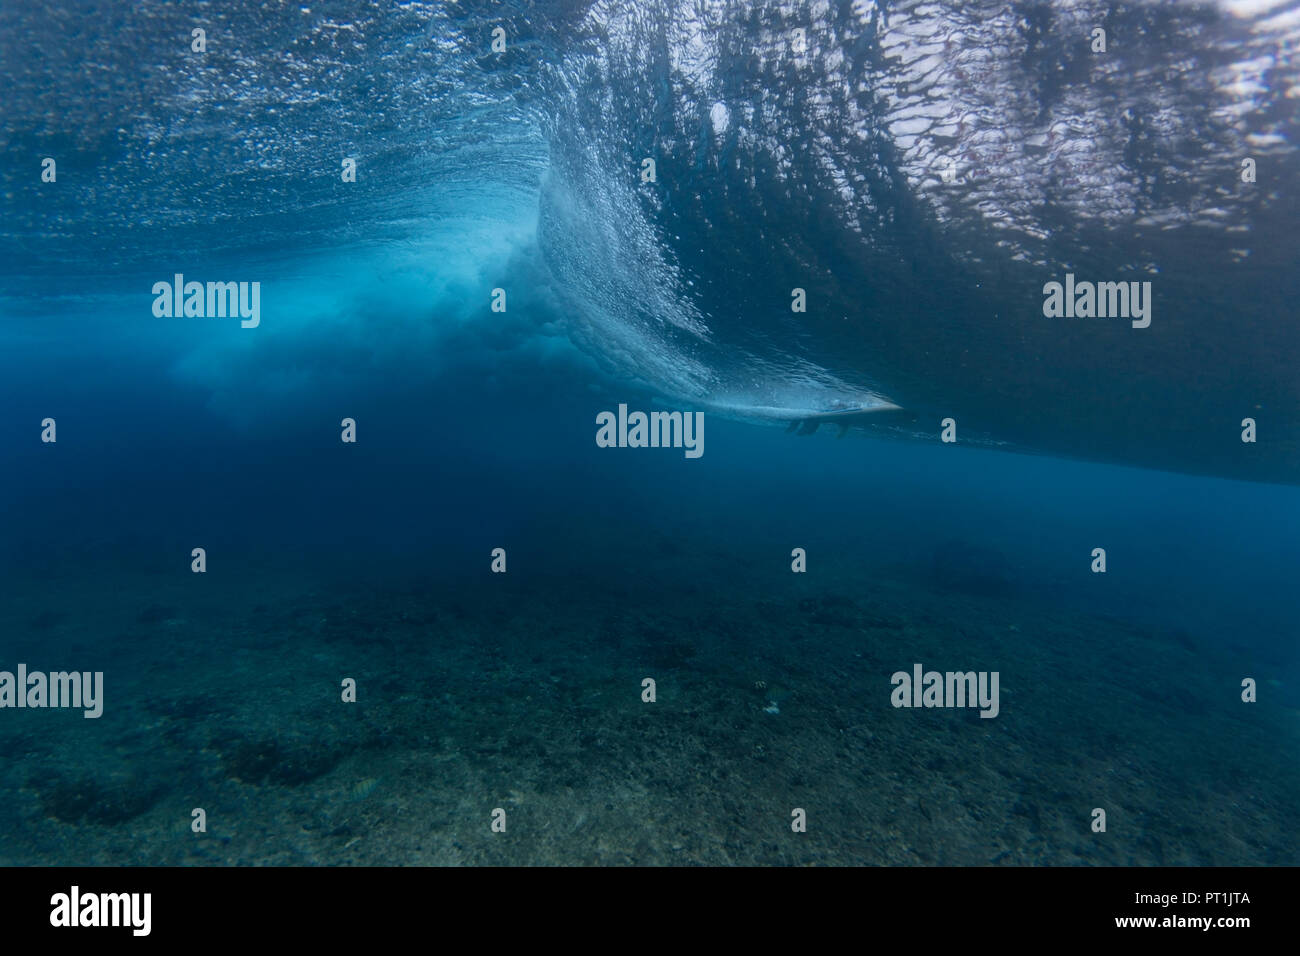 Maledives, Ocean, underwater shot, wave - Stock Image